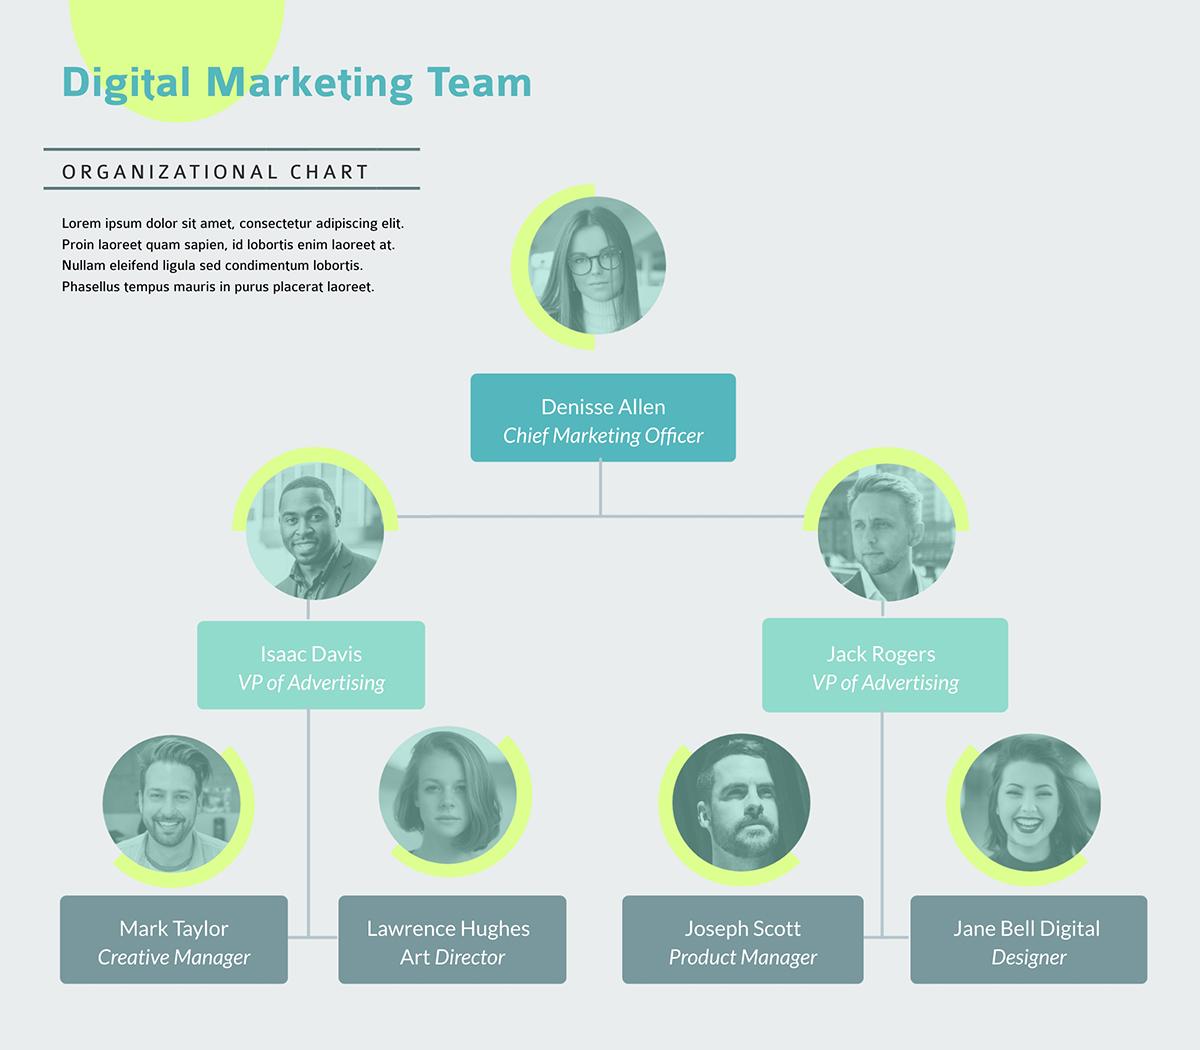 A digital marketing team flowchart template available in Visme.